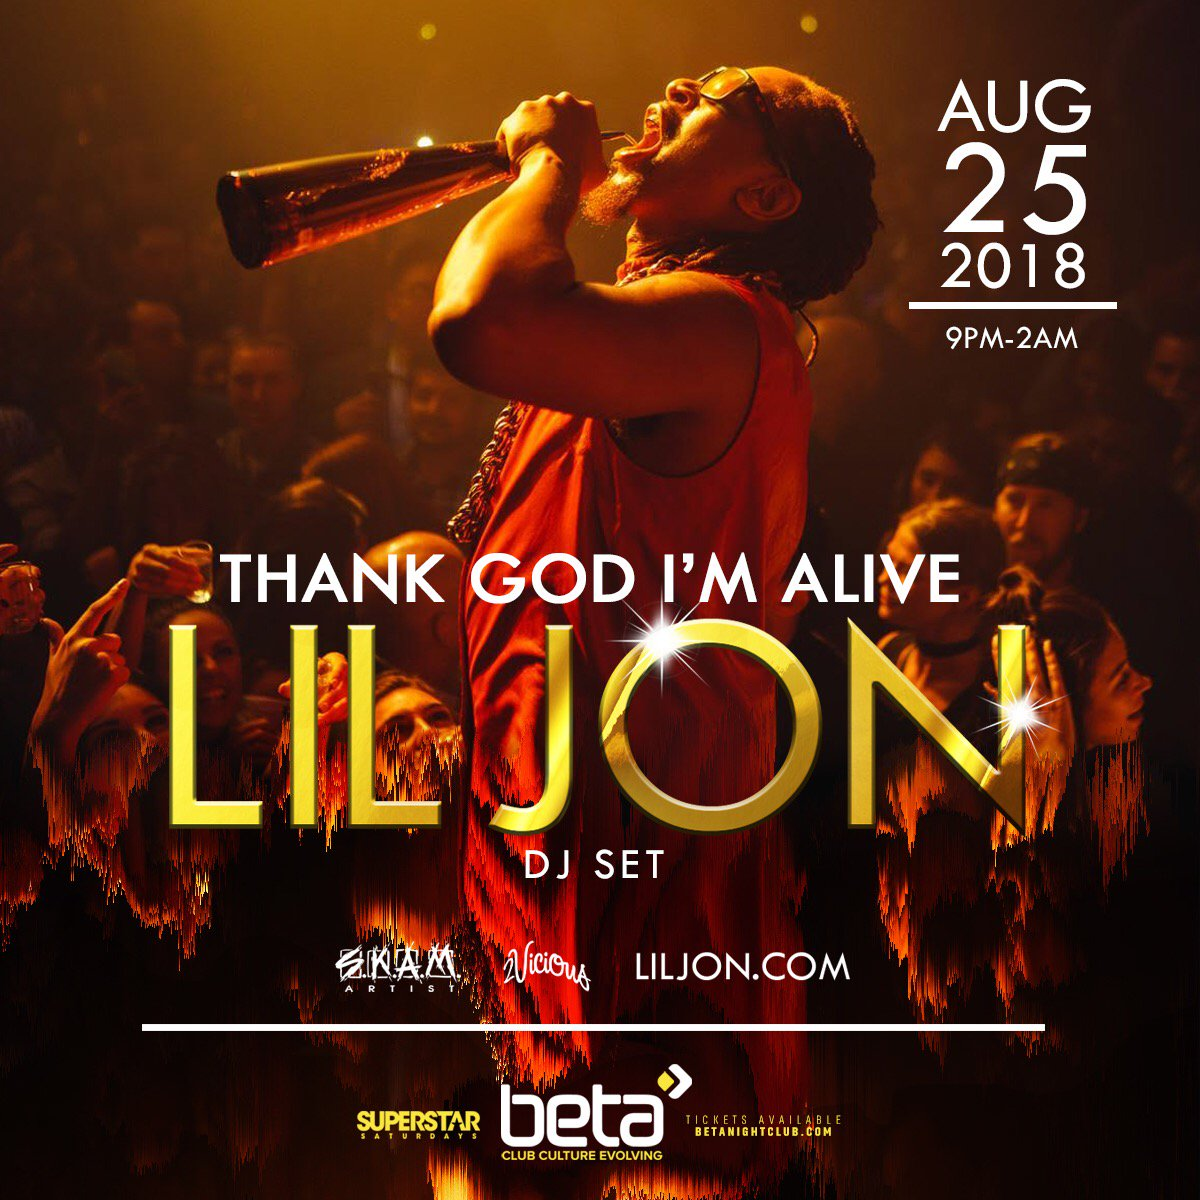 RT @BetaNightclub: Denver favorite @LilJon is back for #SuperstarSaturdays 8/25! Tickets: https://t.co/f6X1JxSWRm https://t.co/jJfo2WEwNZ